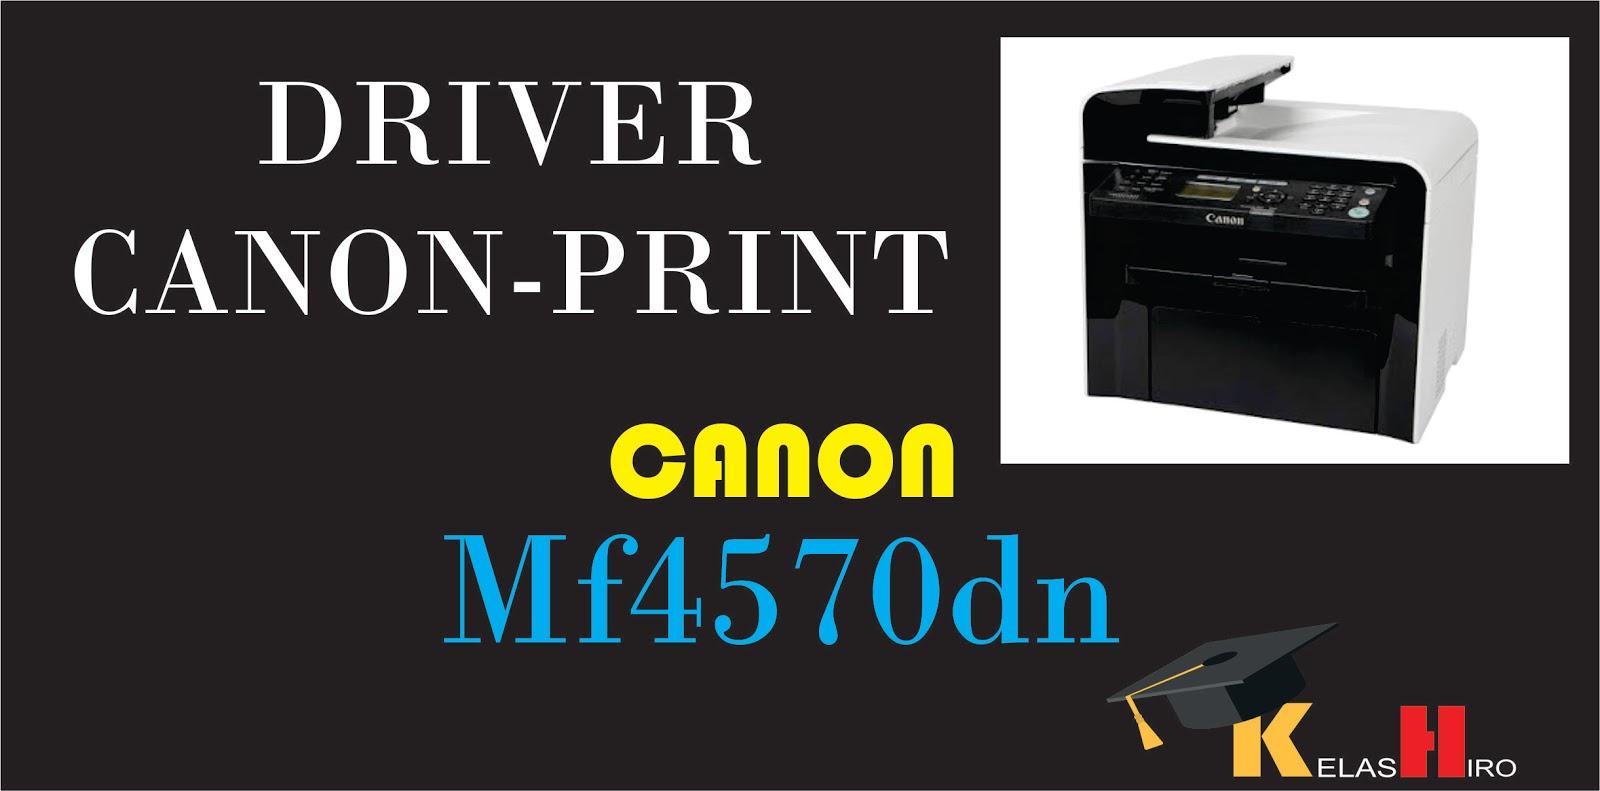 CANON MF4570DN MACINTOSH DRIVERS FOR WINDOWS 10